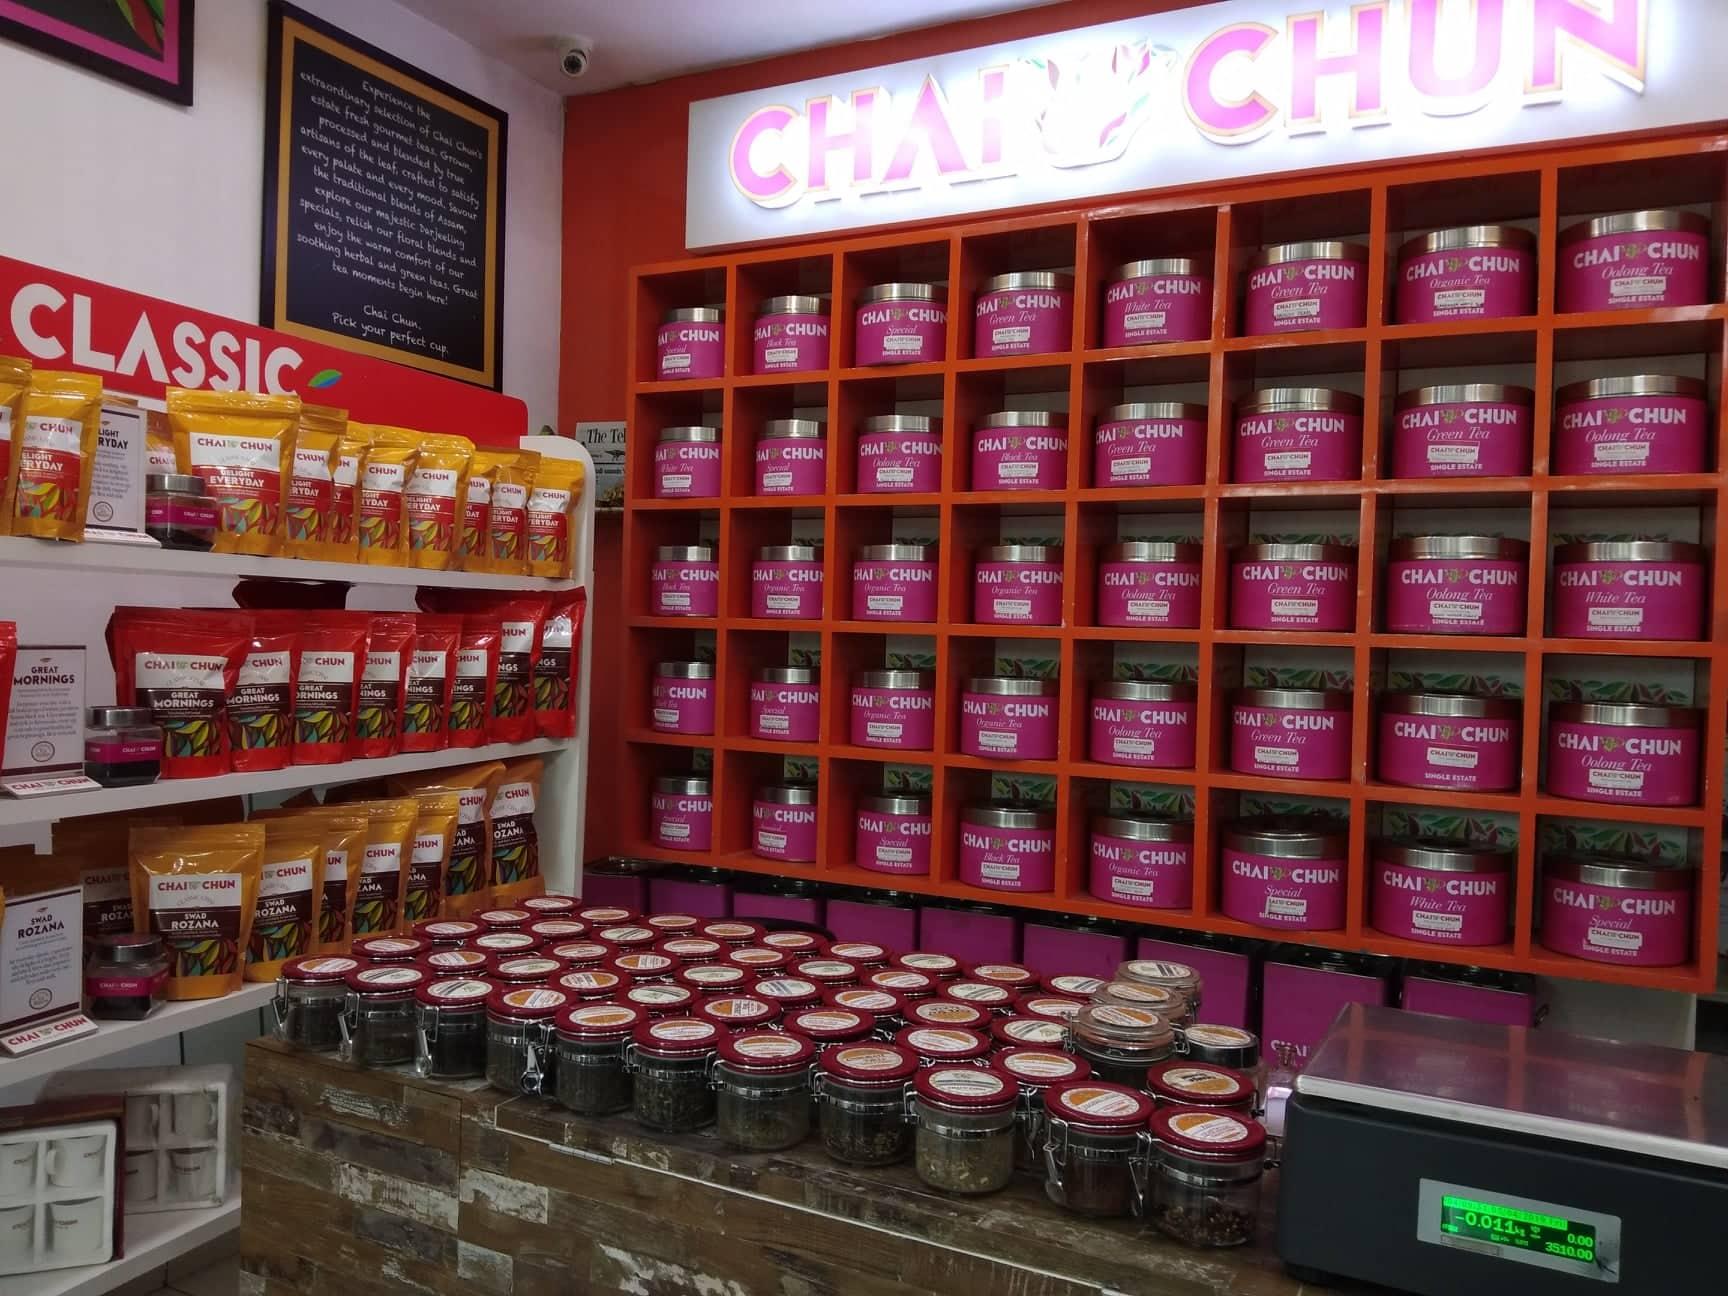 Chai chaun darjeeling